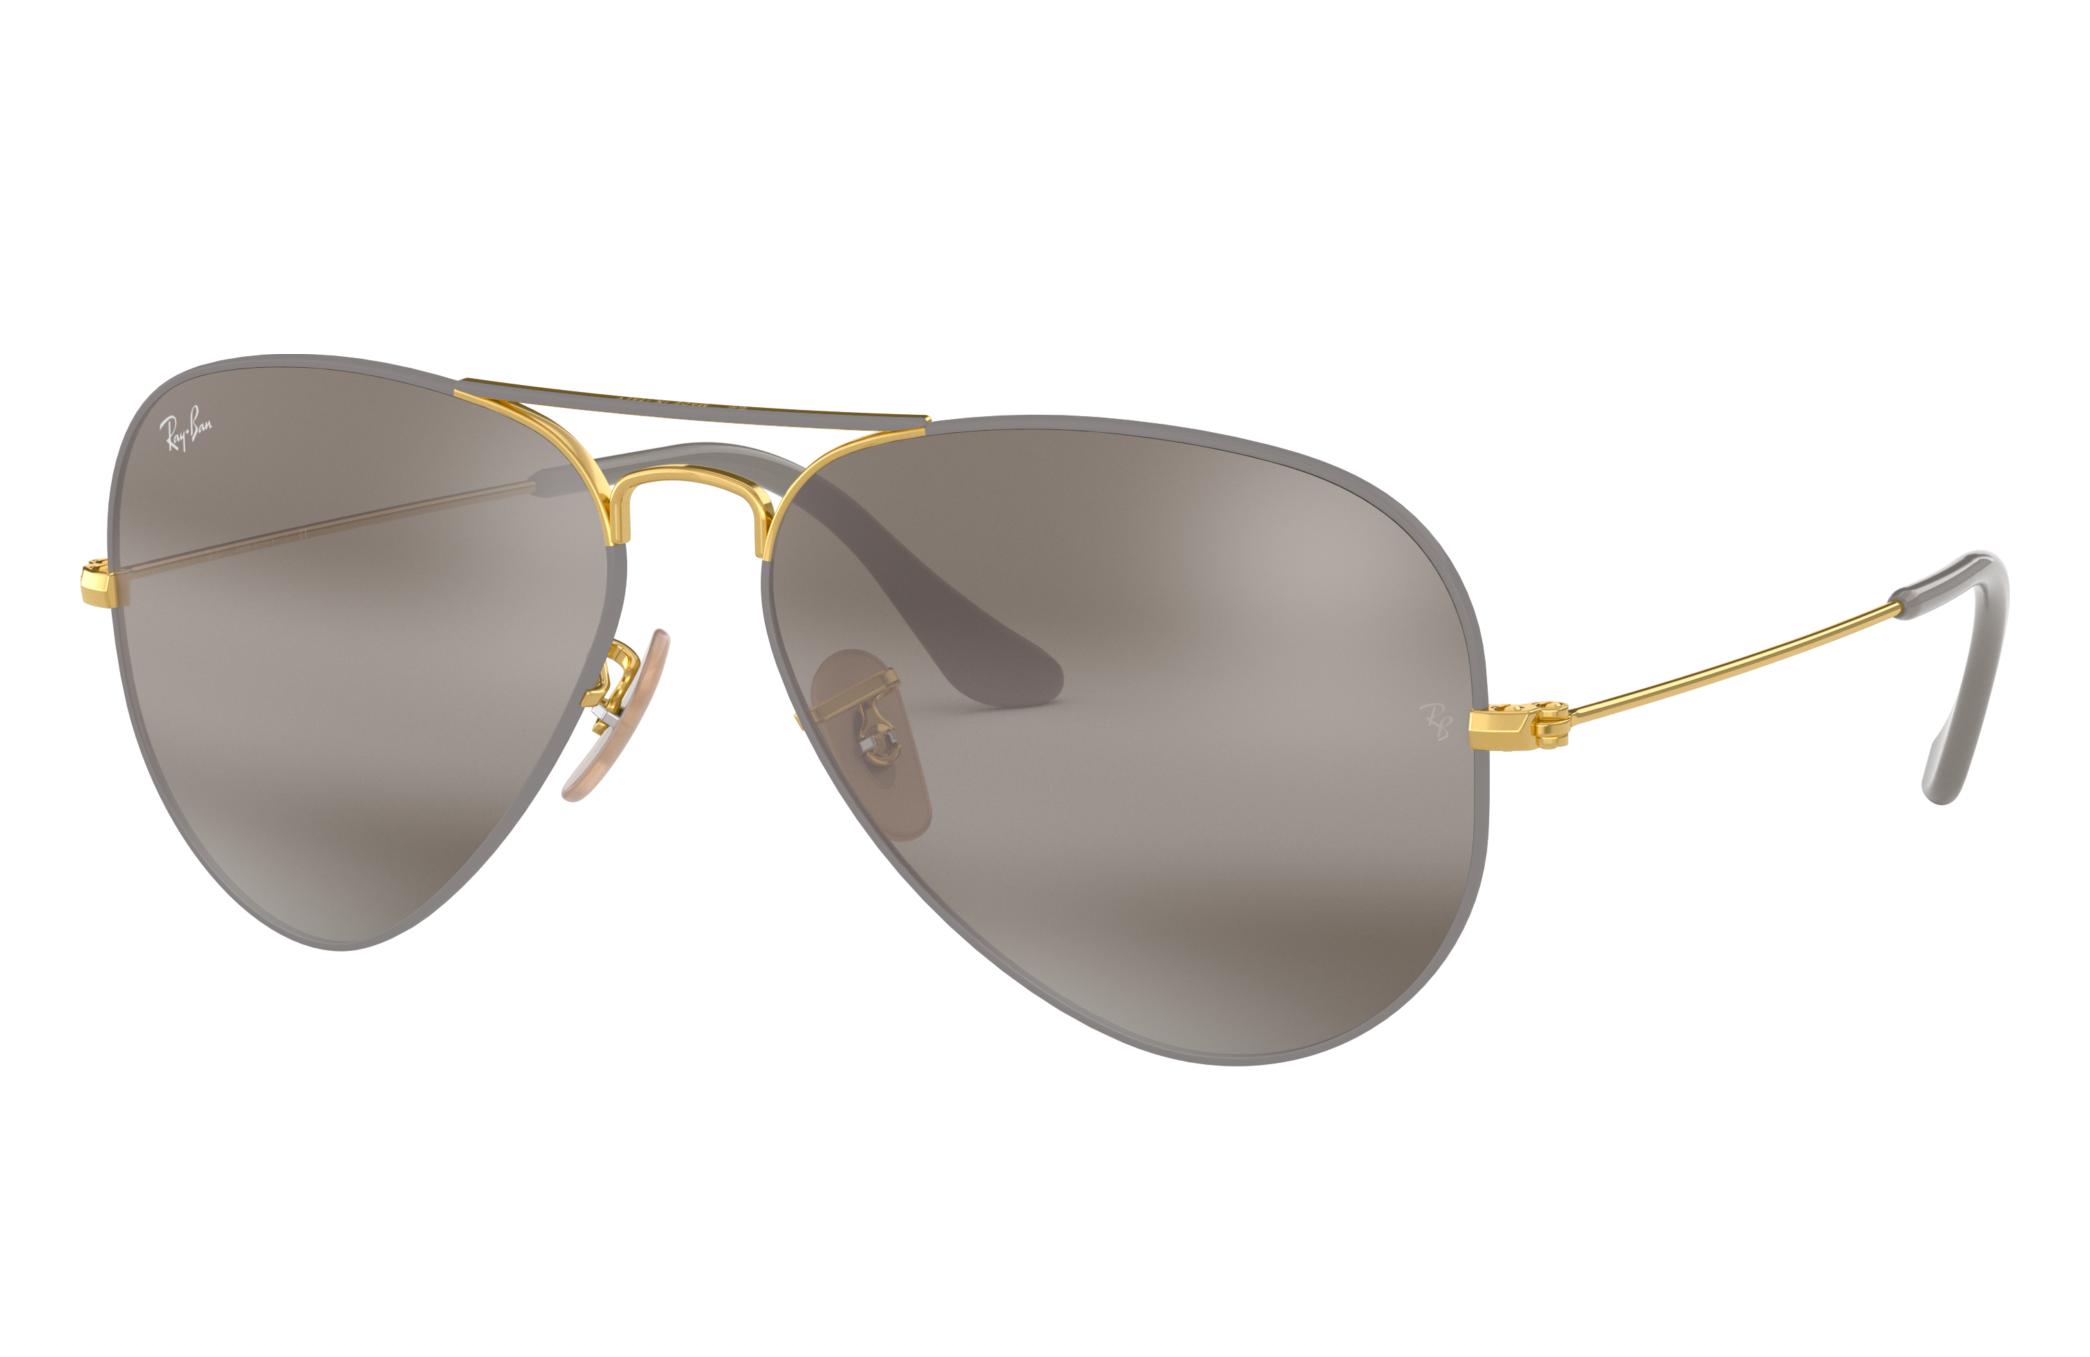 Ray-Ban Aviator Mirror Gold, Grey Lenses - RB3025